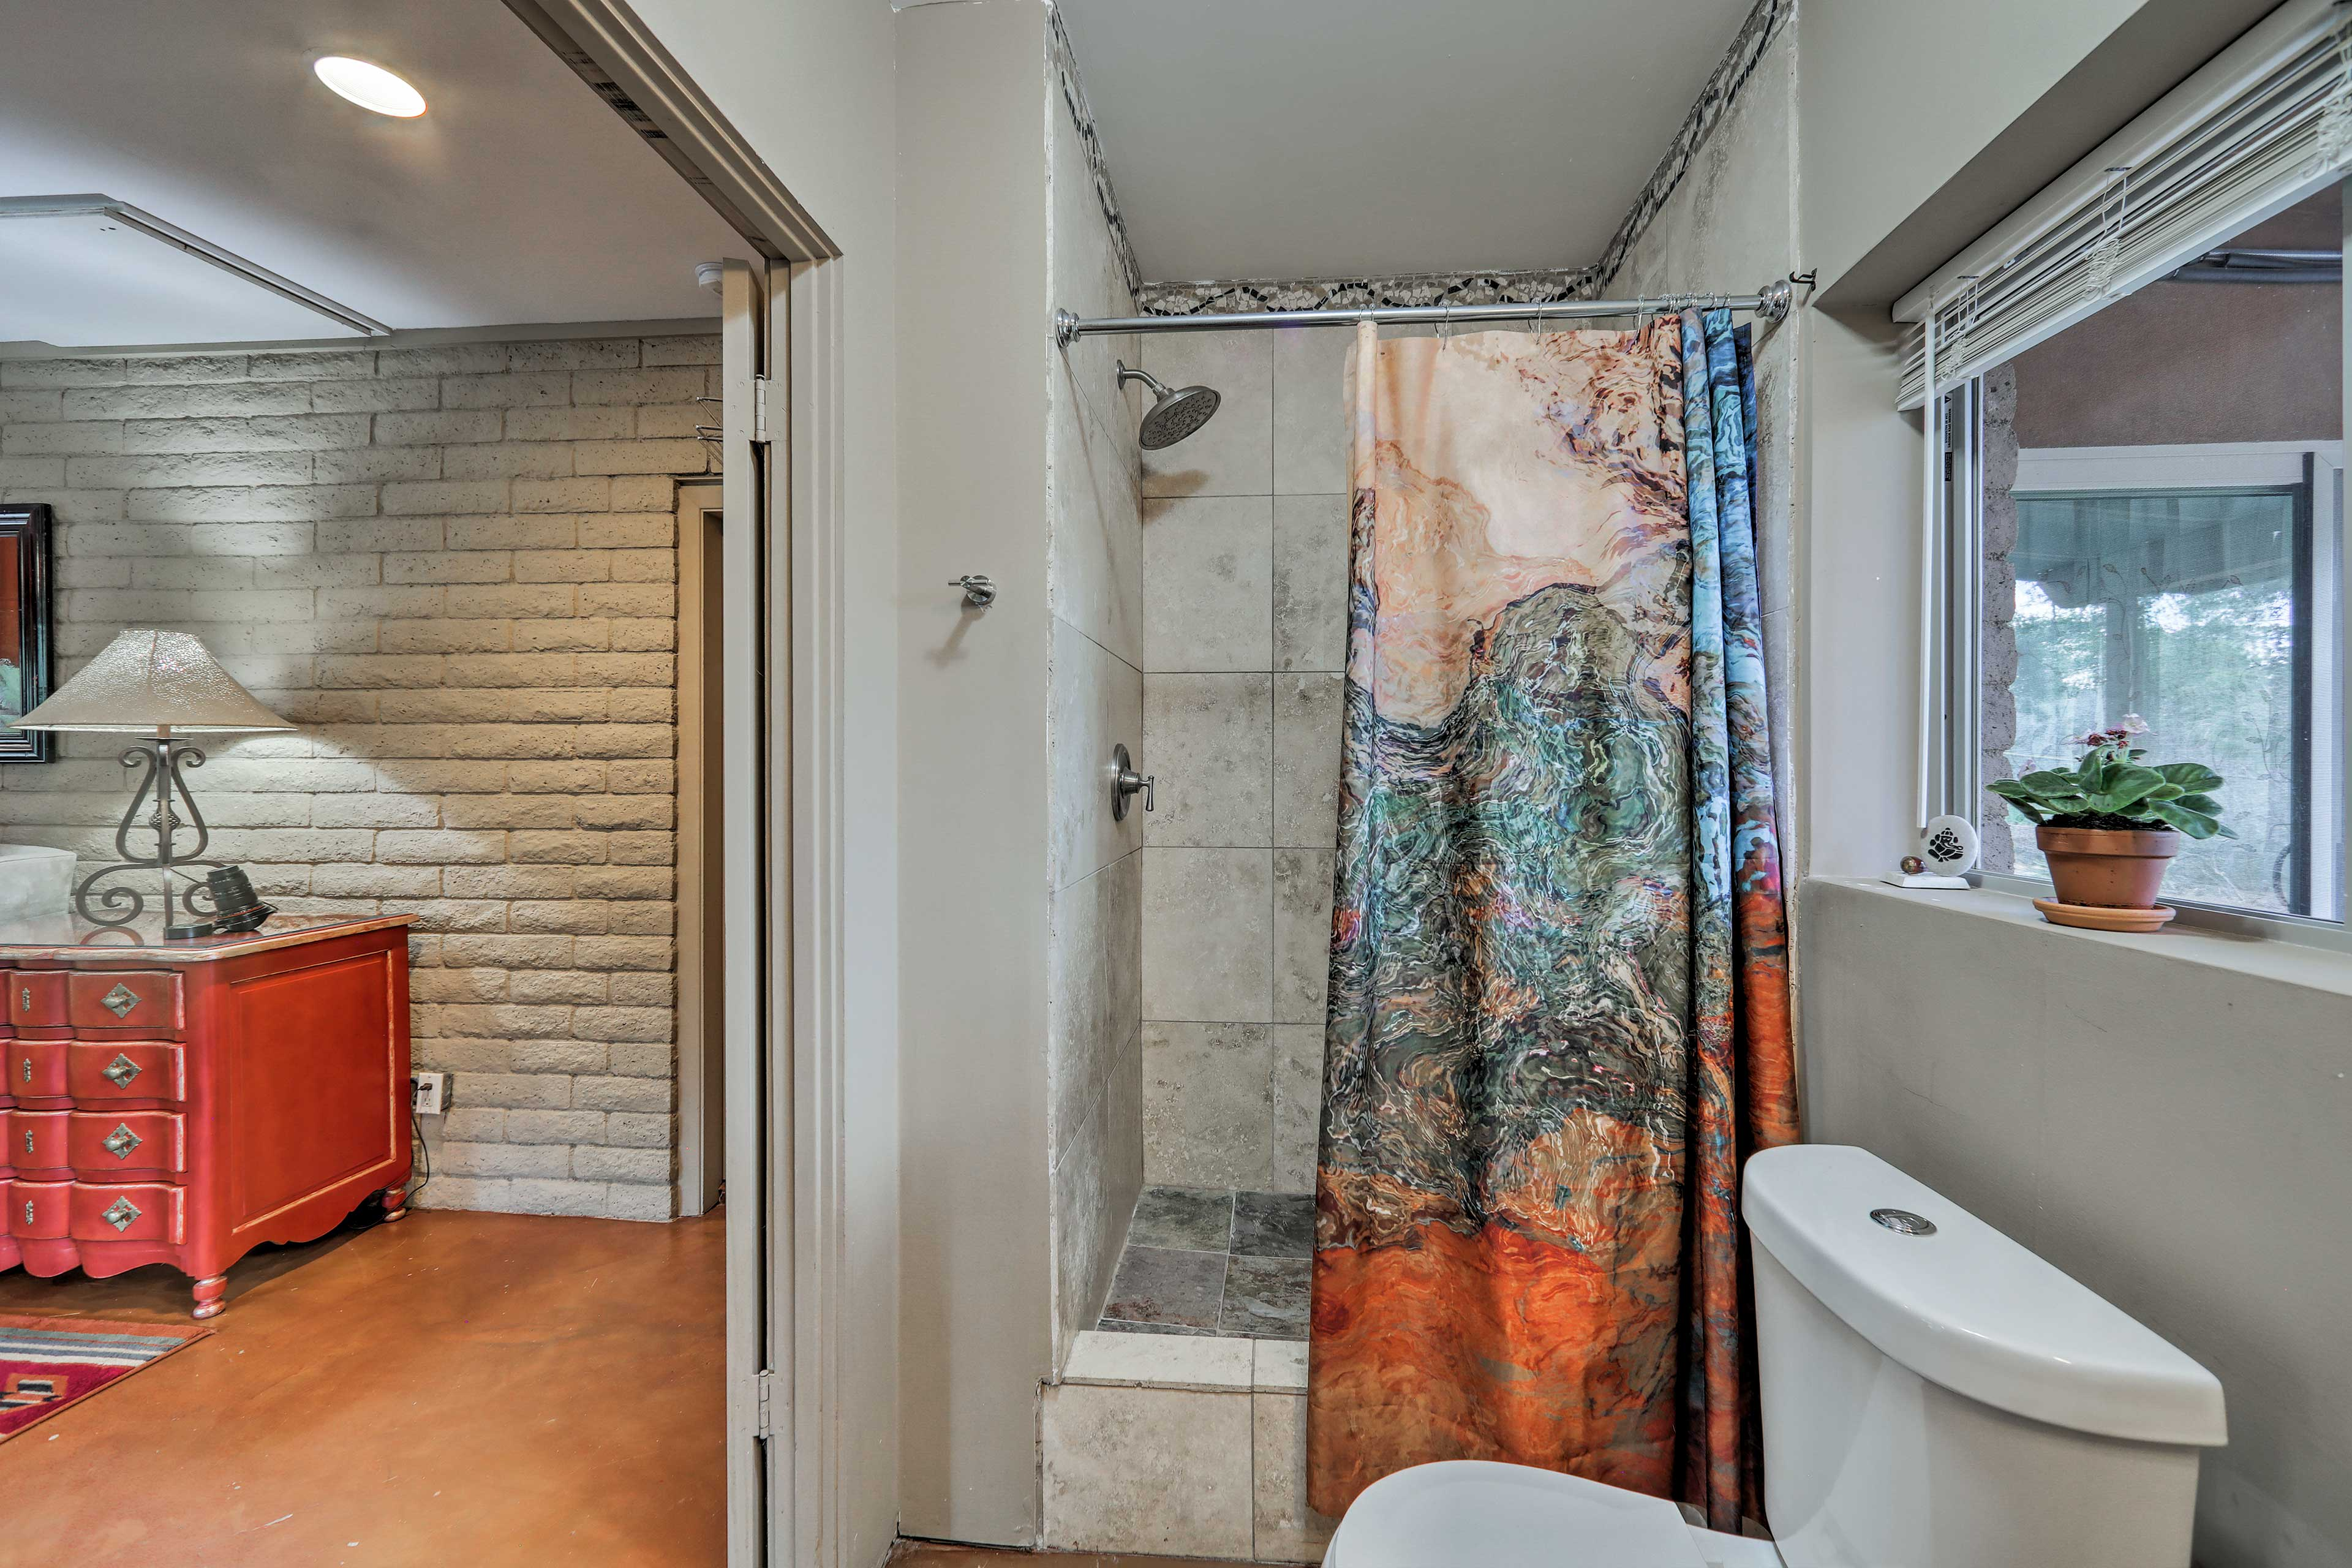 The full bathroom includes a sleek walk-in shower.